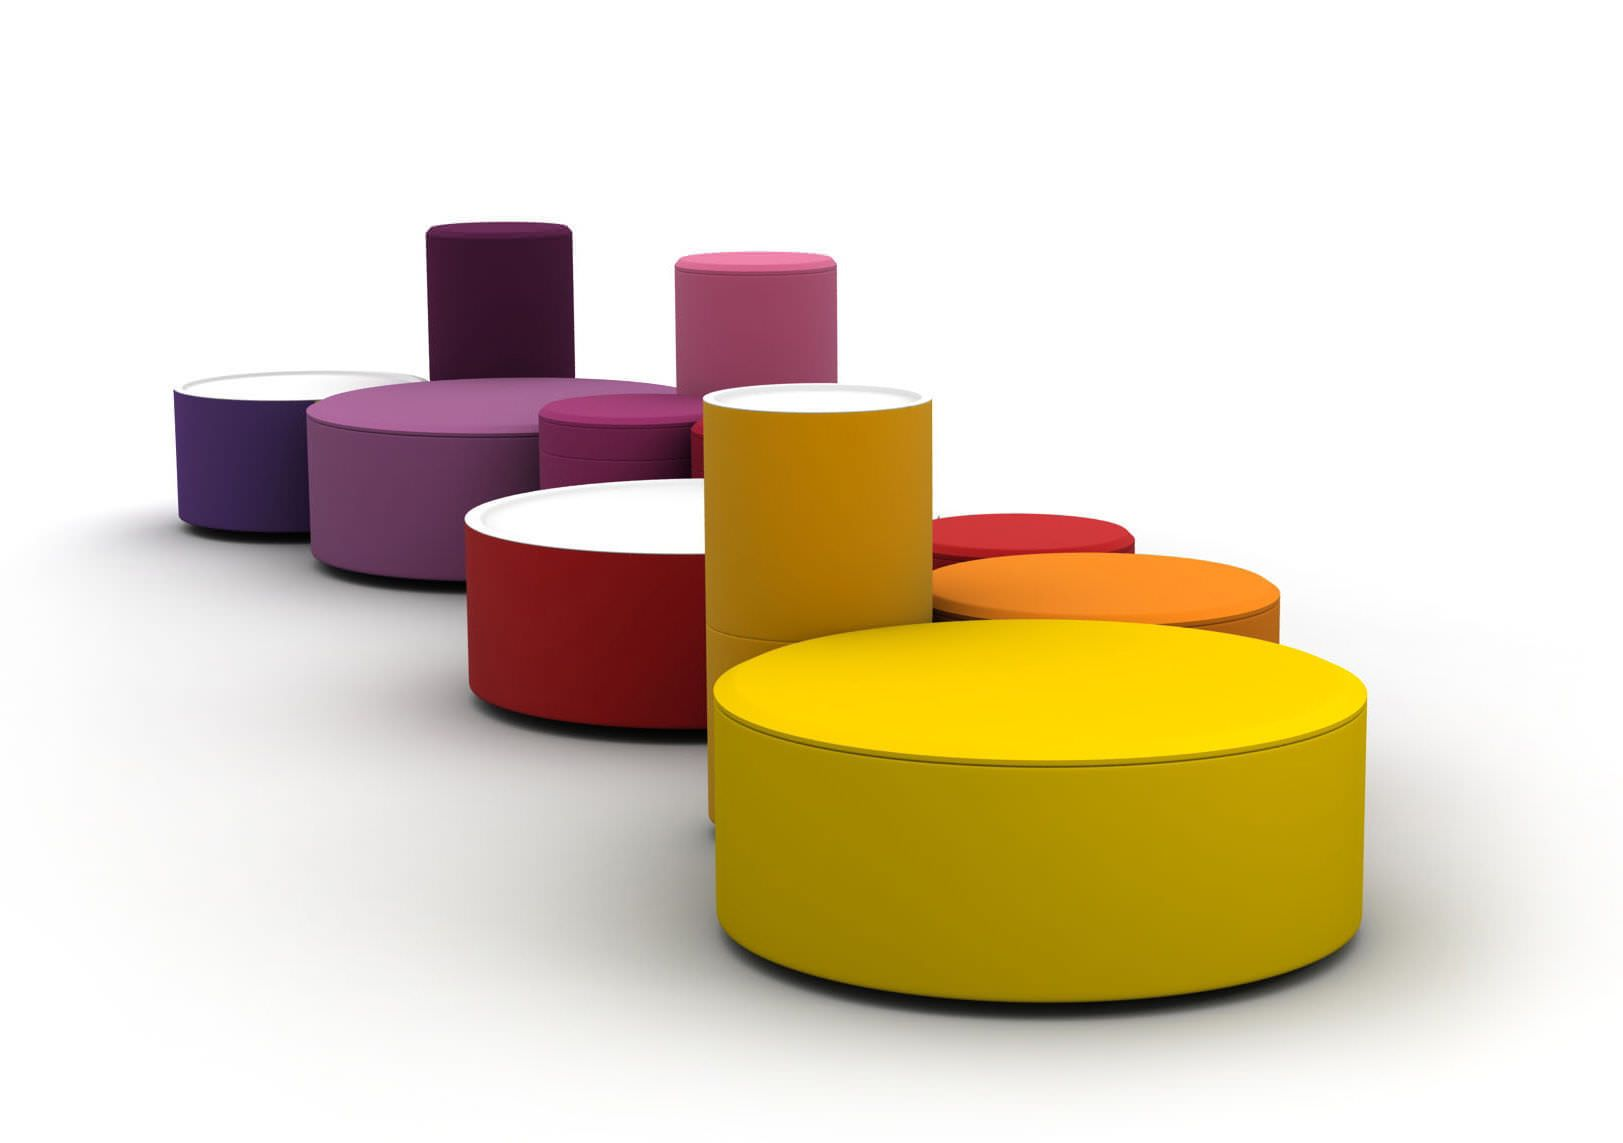 pop art design pouf / textile / modular / upholstered